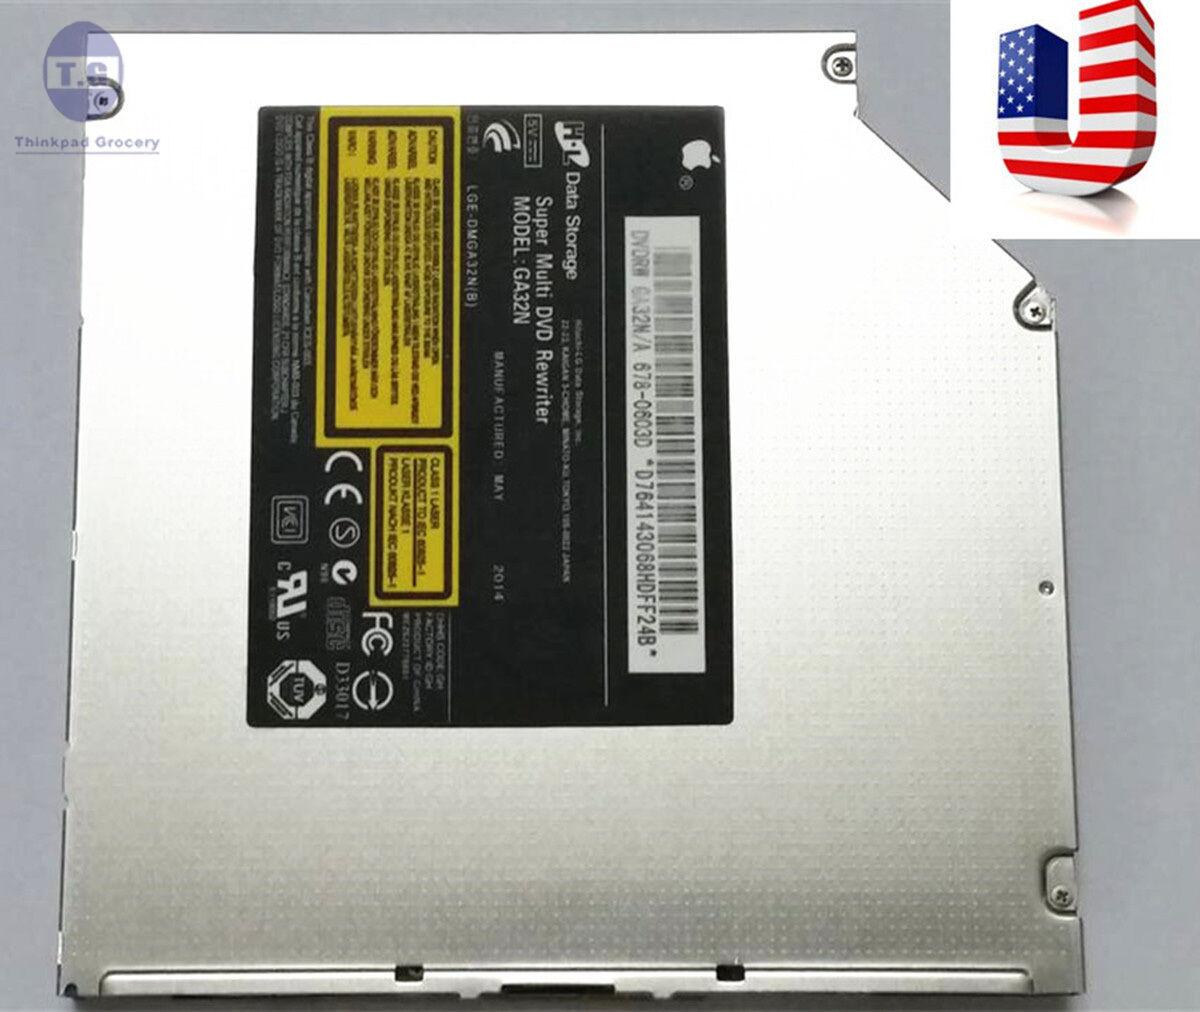 LG For Apple Imac Mid-2011 A1311 Mc309ll/a Imac12,1 Sata ...